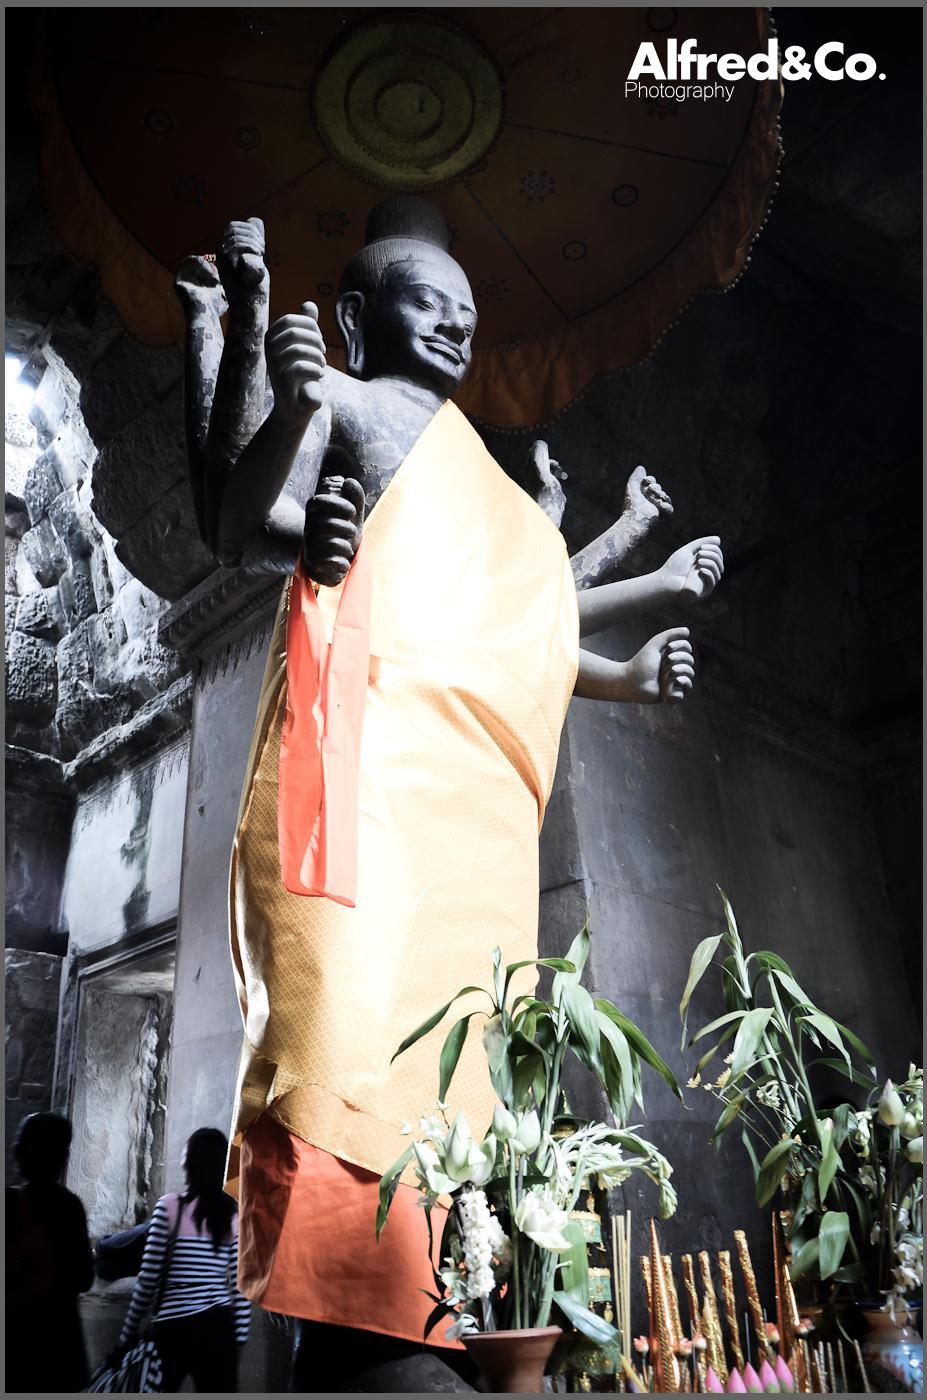 Angkor Wat, Siem Reap - Cambodia. Alfredandco photography, Lancashire